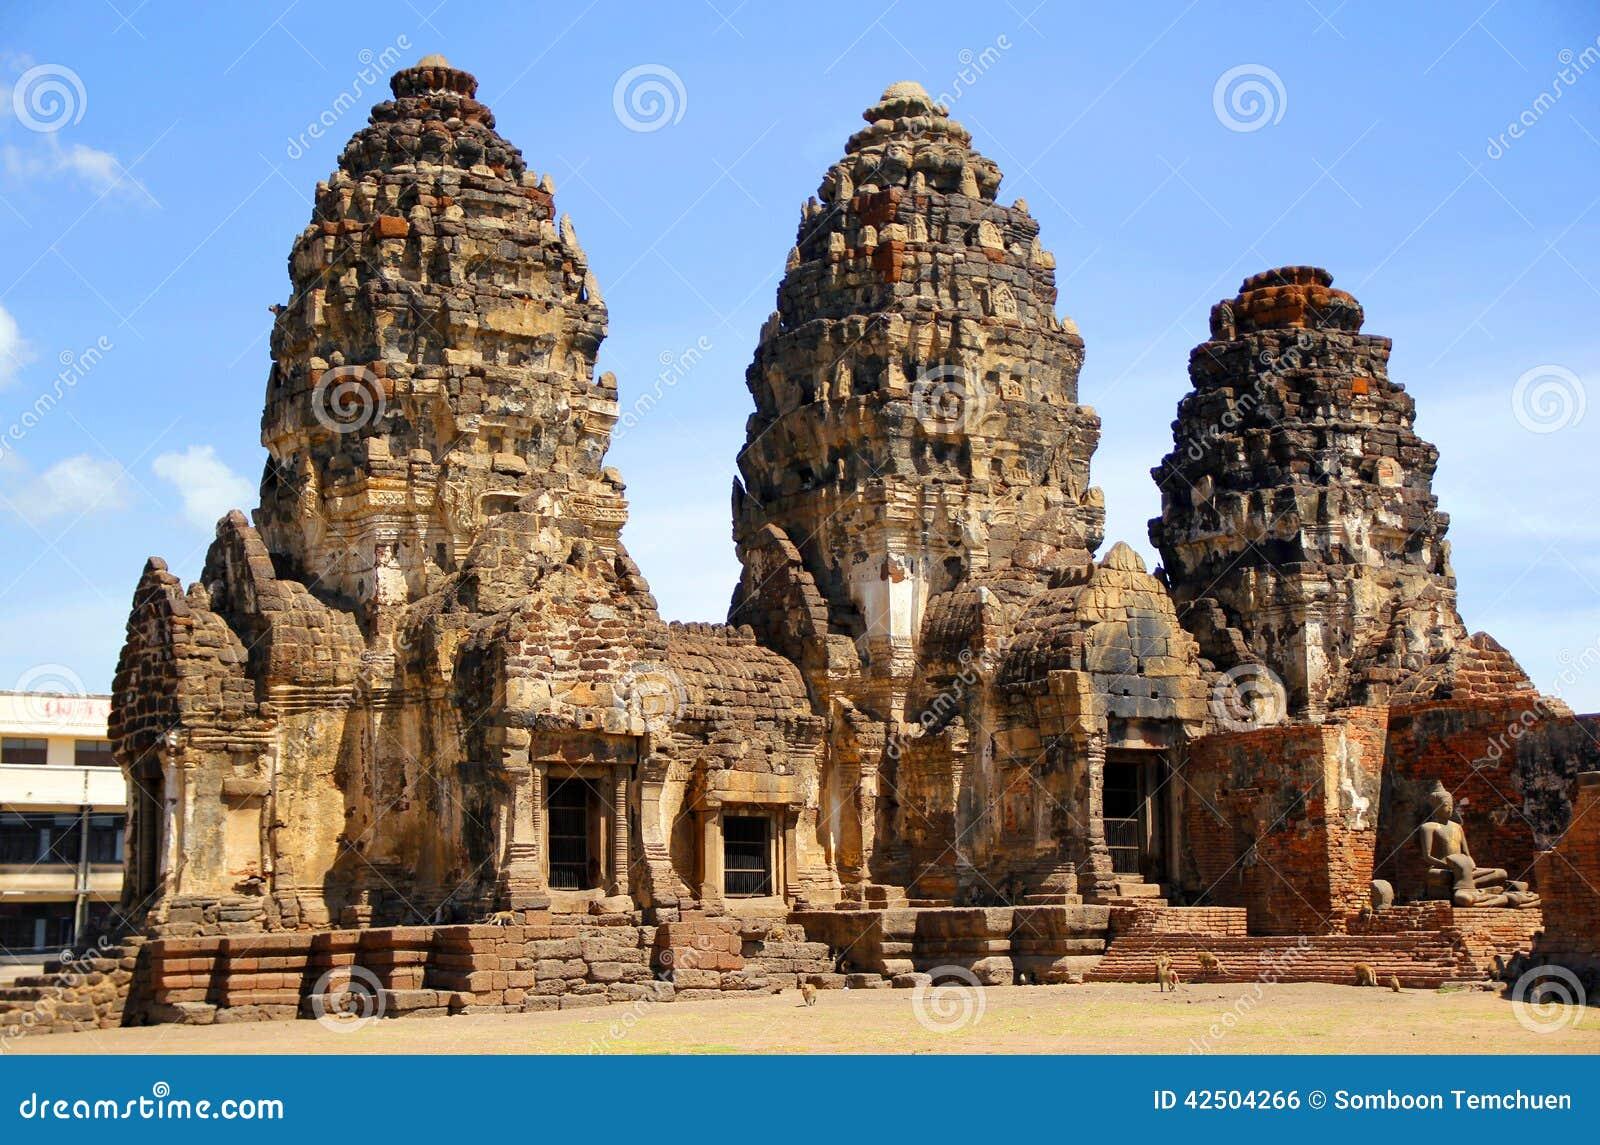 Phra Prang Sam Yot Stock Photo - Image: 42504266